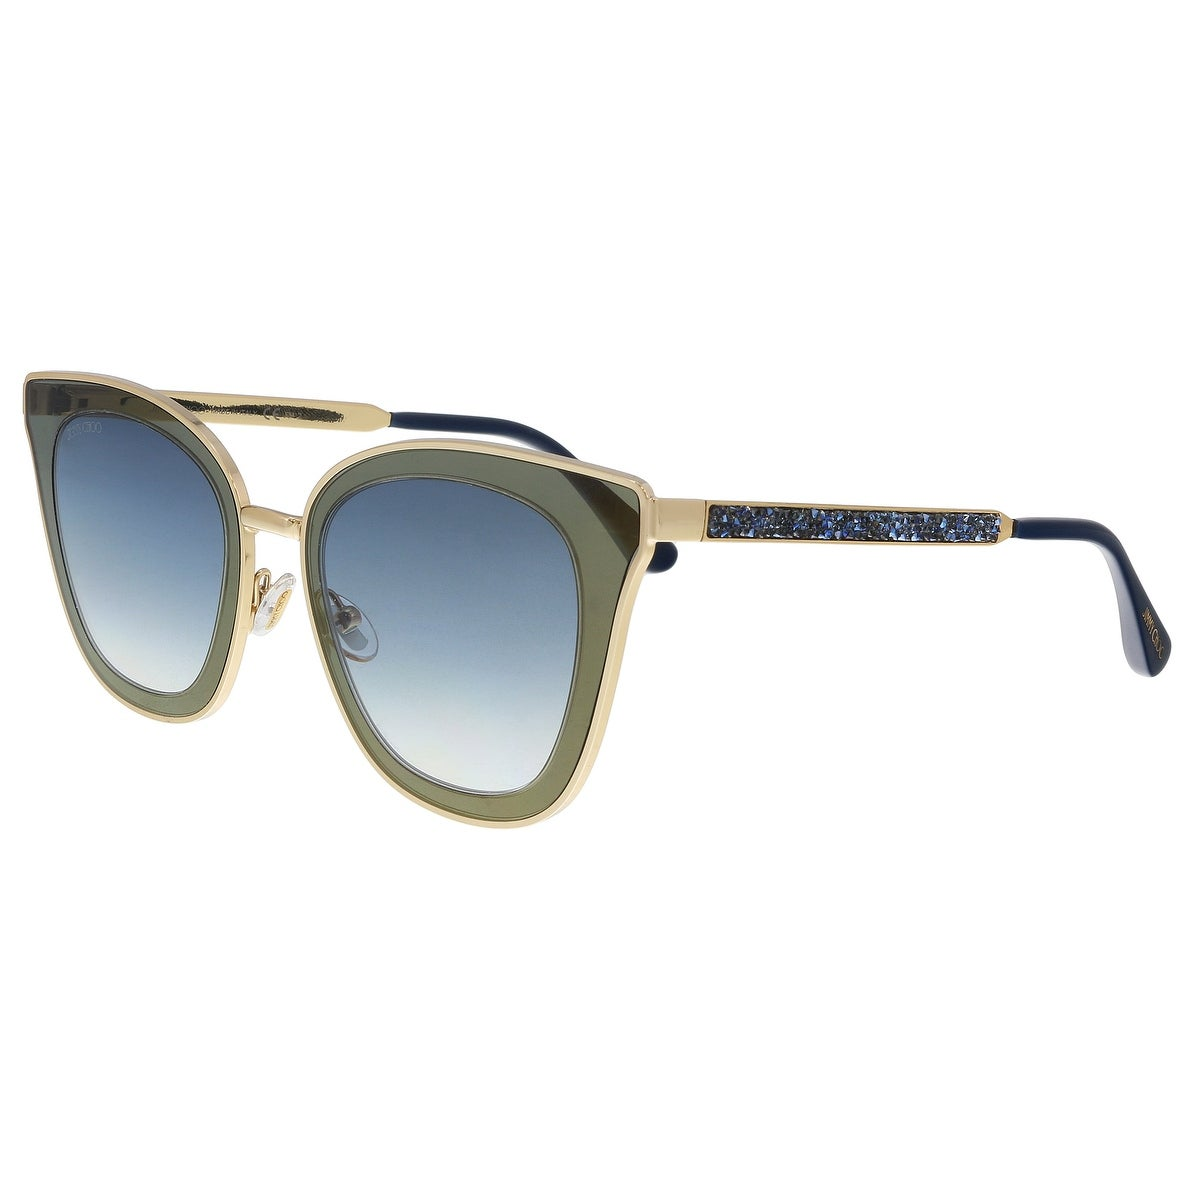 549b93746be3 Shop Jimmy Choo LORY S 0KY2 Gold  Blue Cat Eye Sunglasses - 49-23 ...